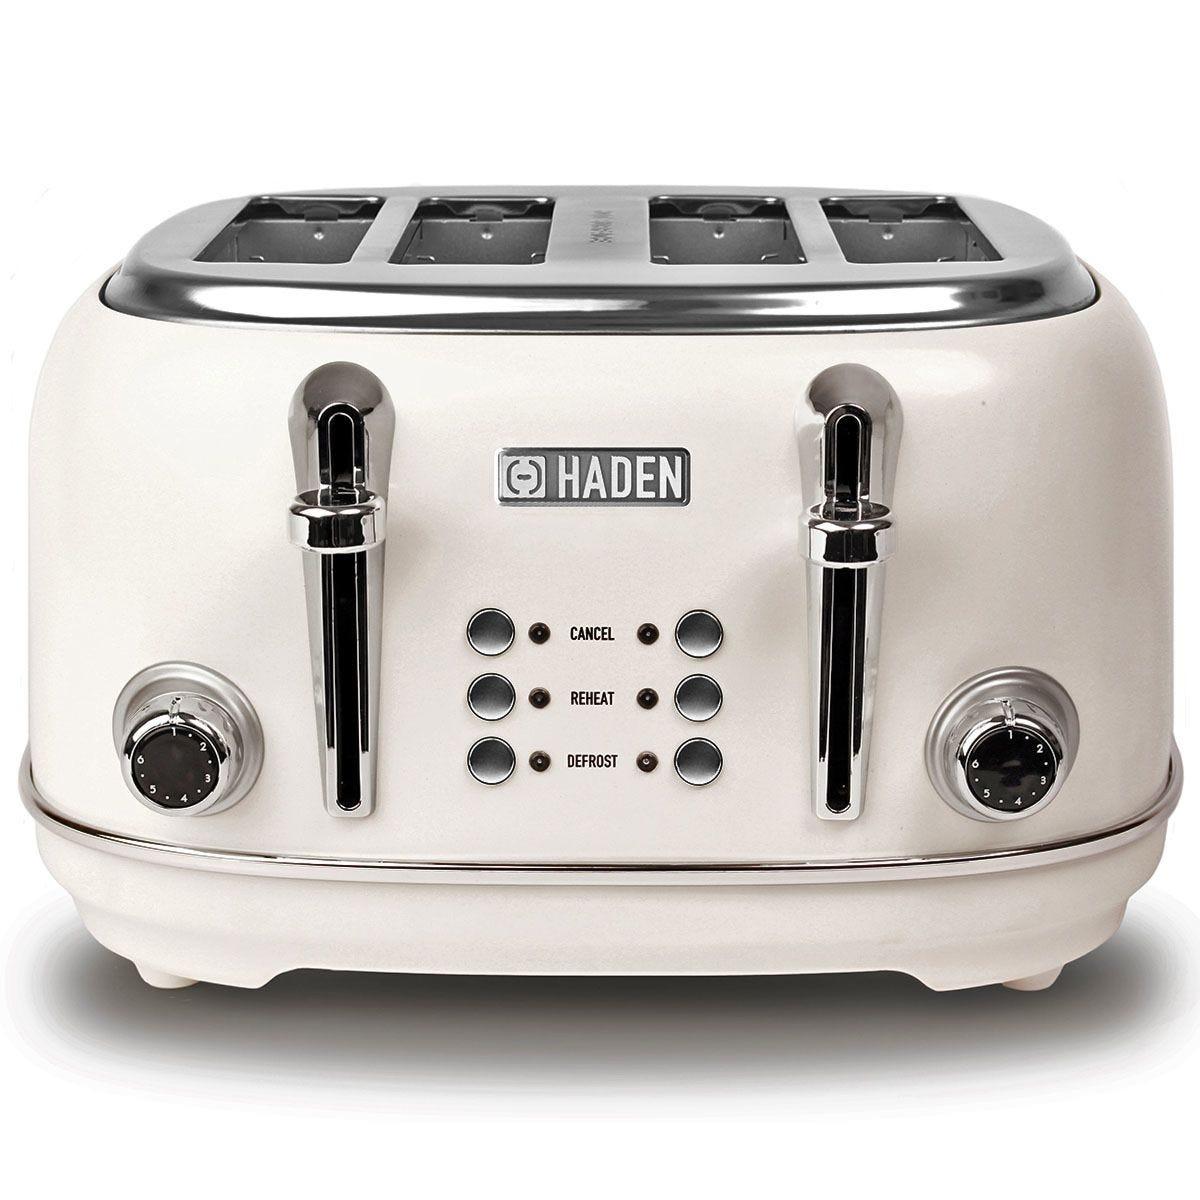 Haden 194220 Heritage 4-Slice Toaster - White